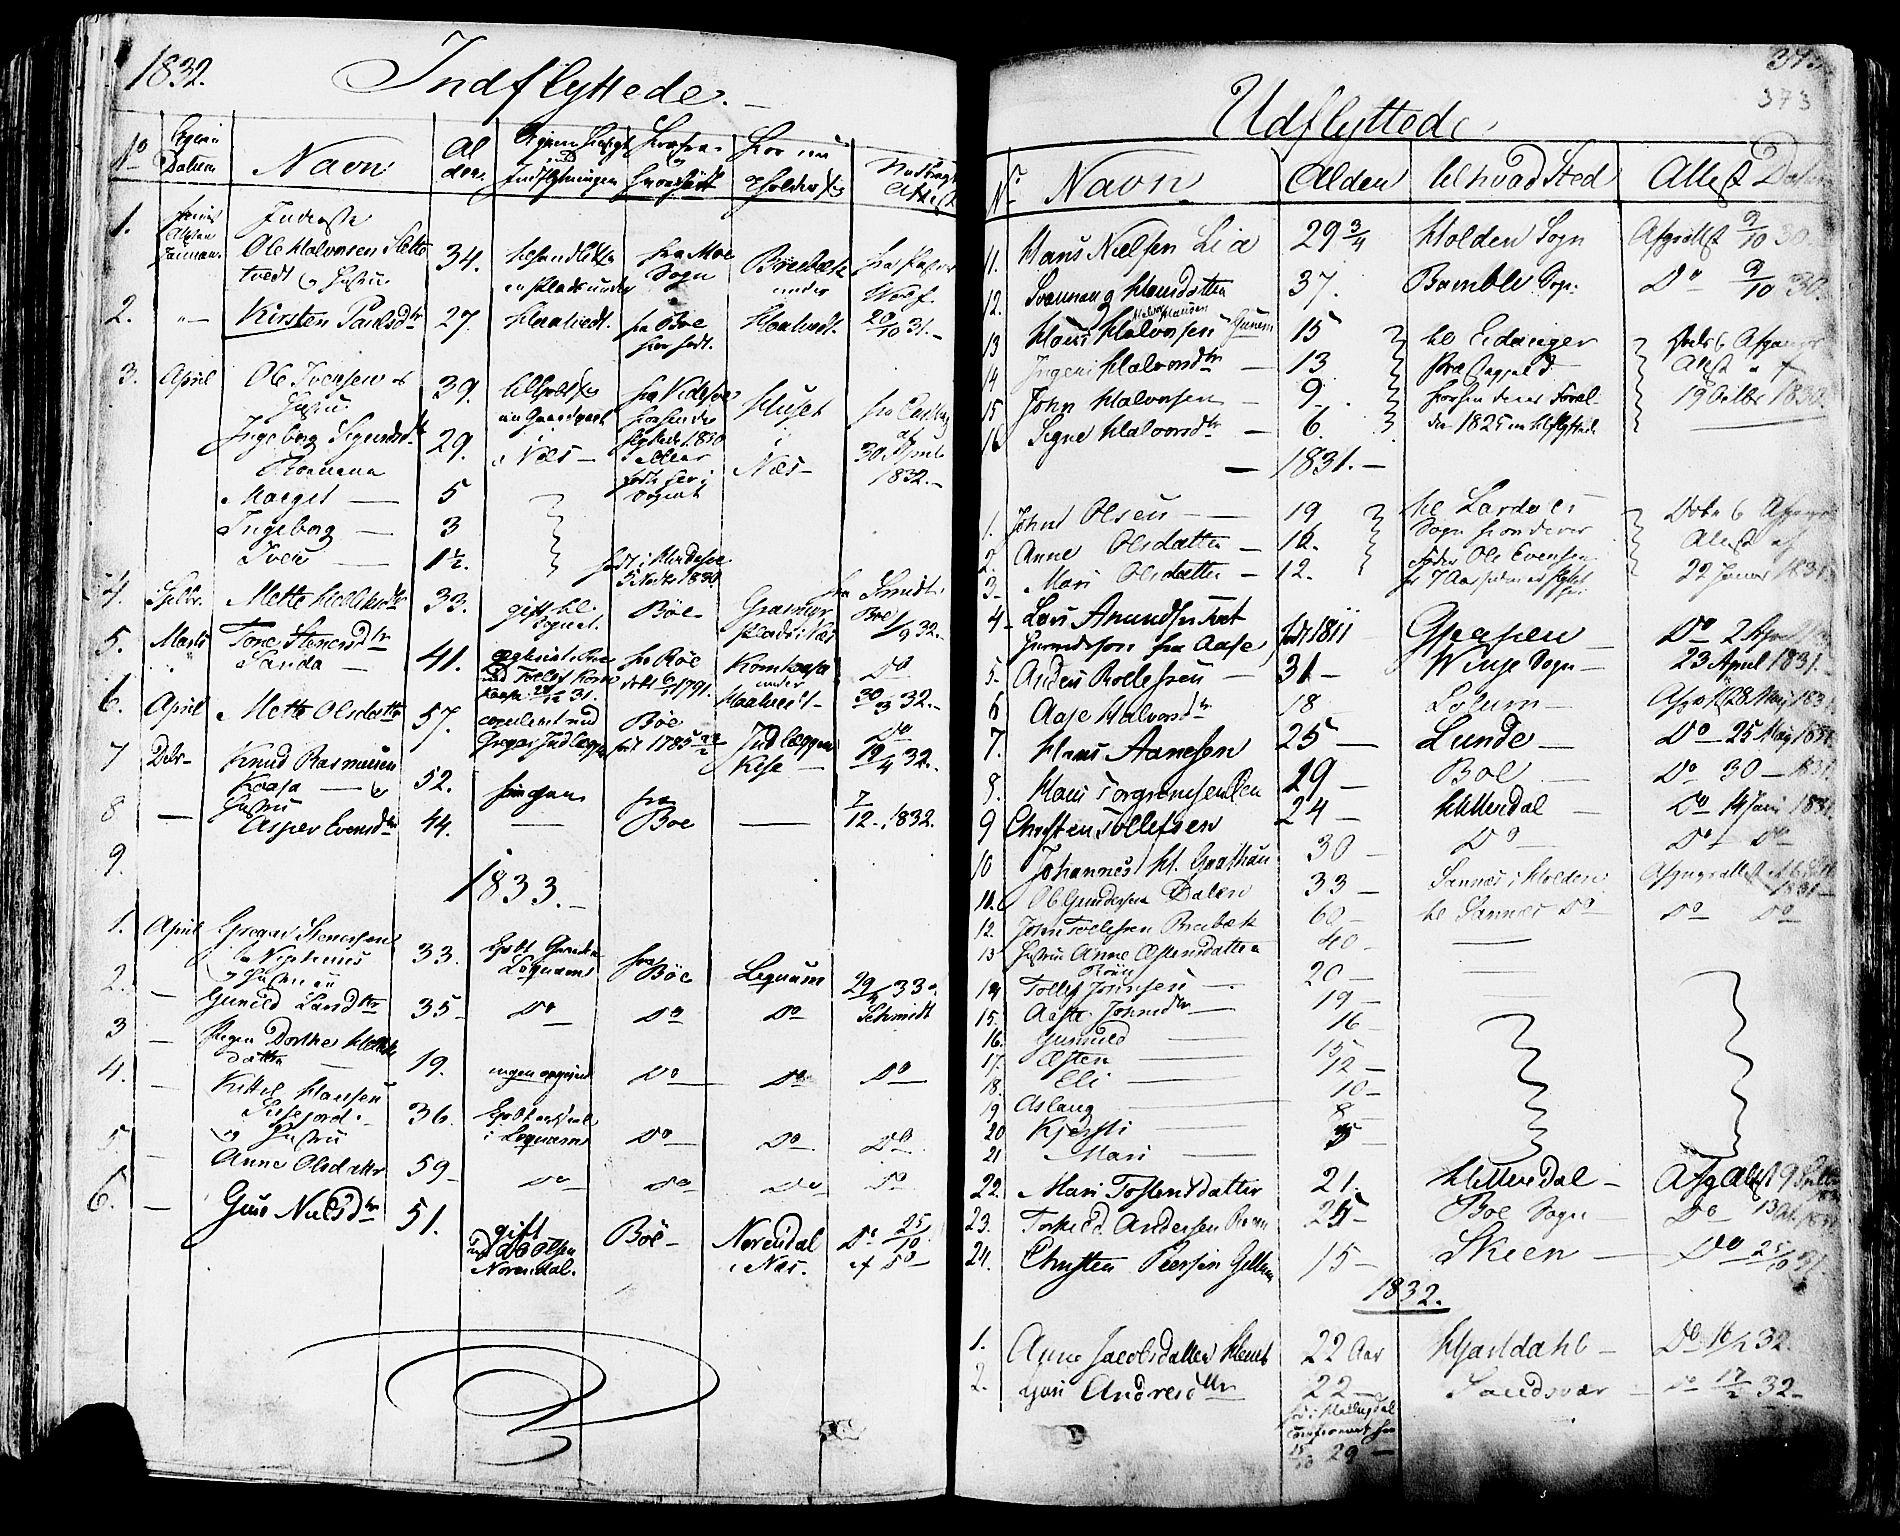 SAKO, Sauherad kirkebøker, F/Fa/L0006: Ministerialbok nr. I 6, 1827-1850, s. 373